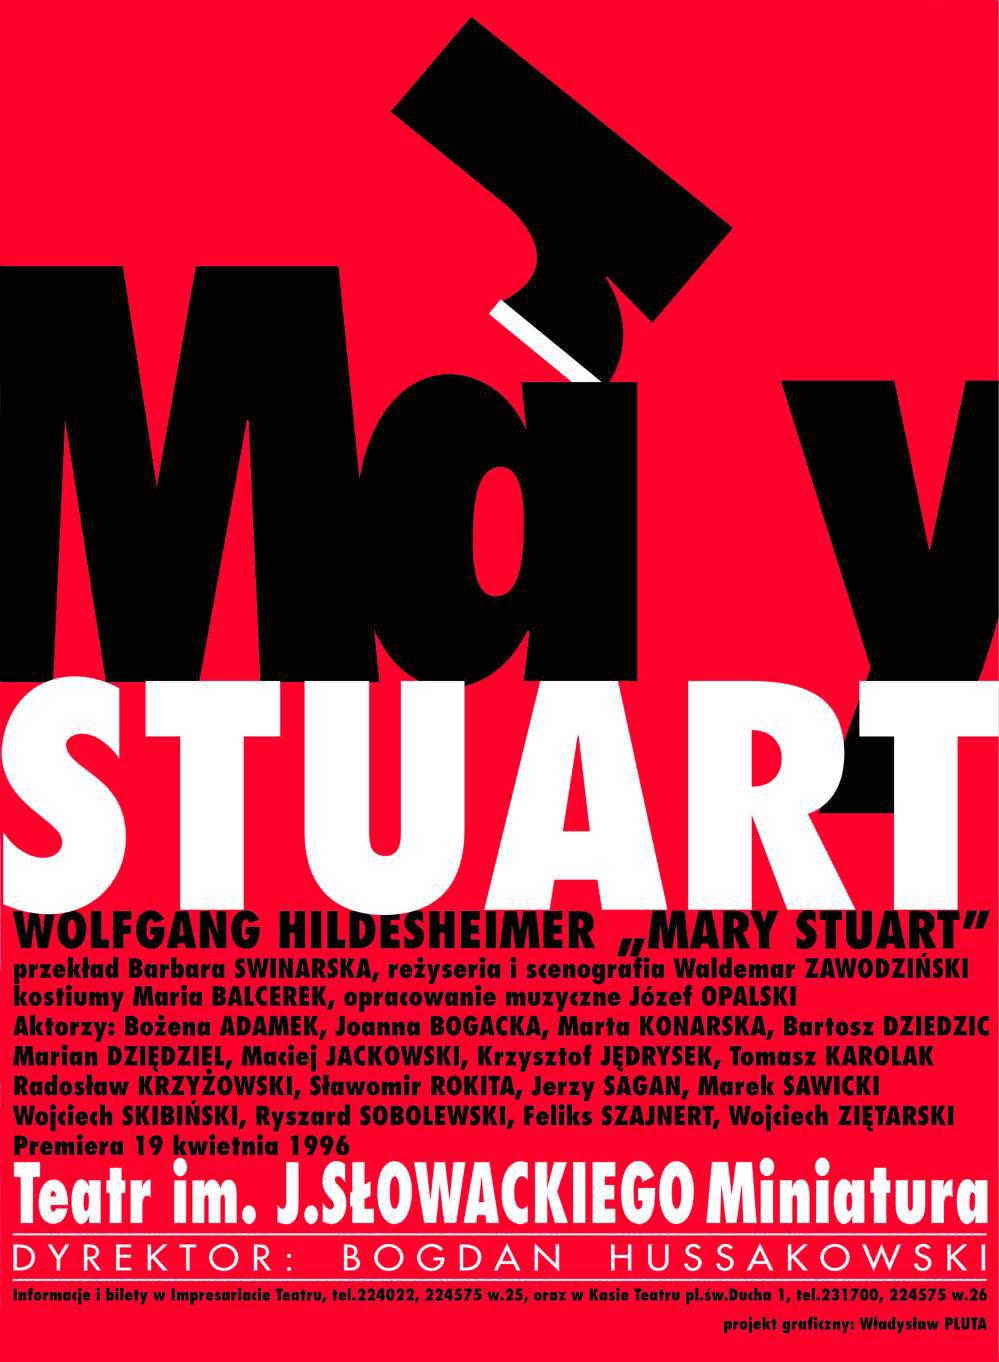 Wladyslaw-Pluta-affiche-mary-stuart-1996